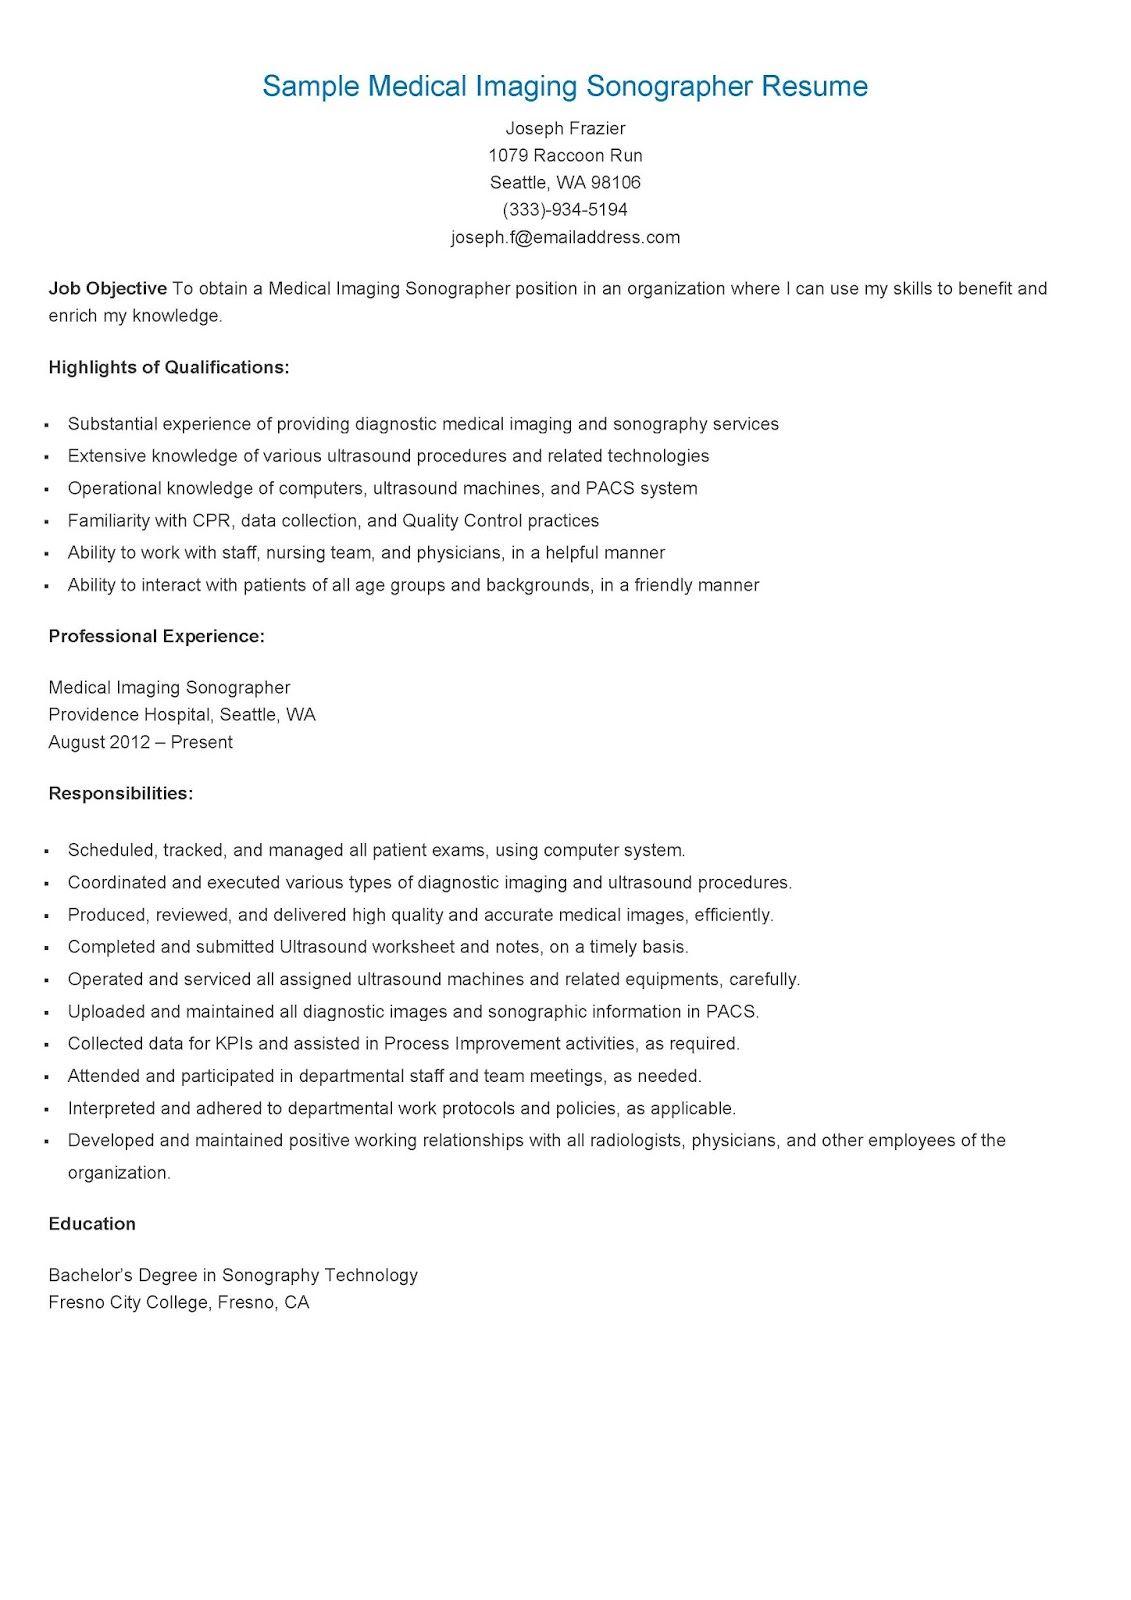 sample medical imaging sonographer resume